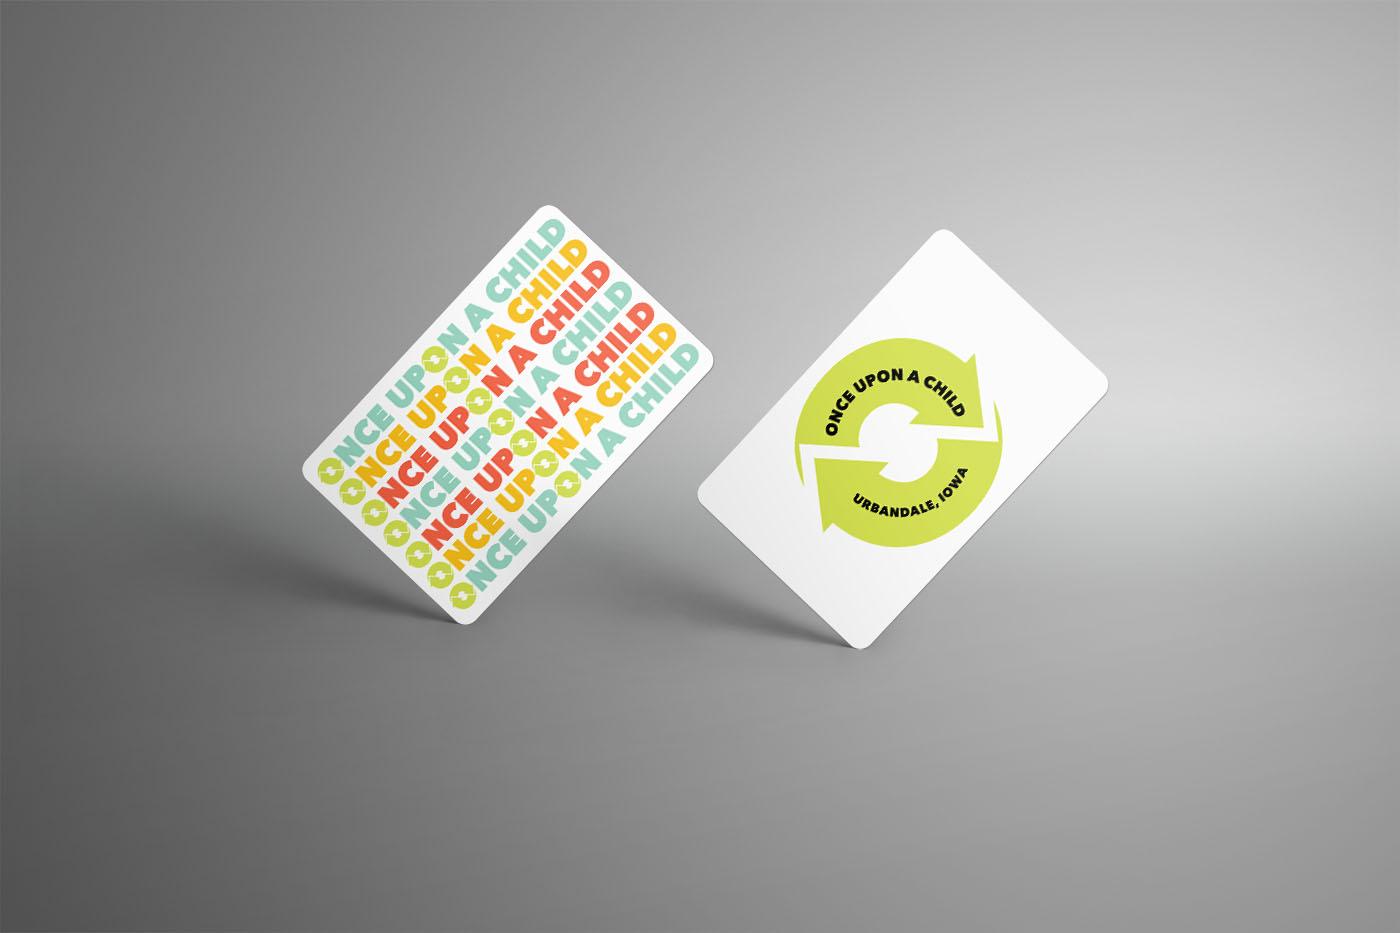 OUAC Giftcard Mockup